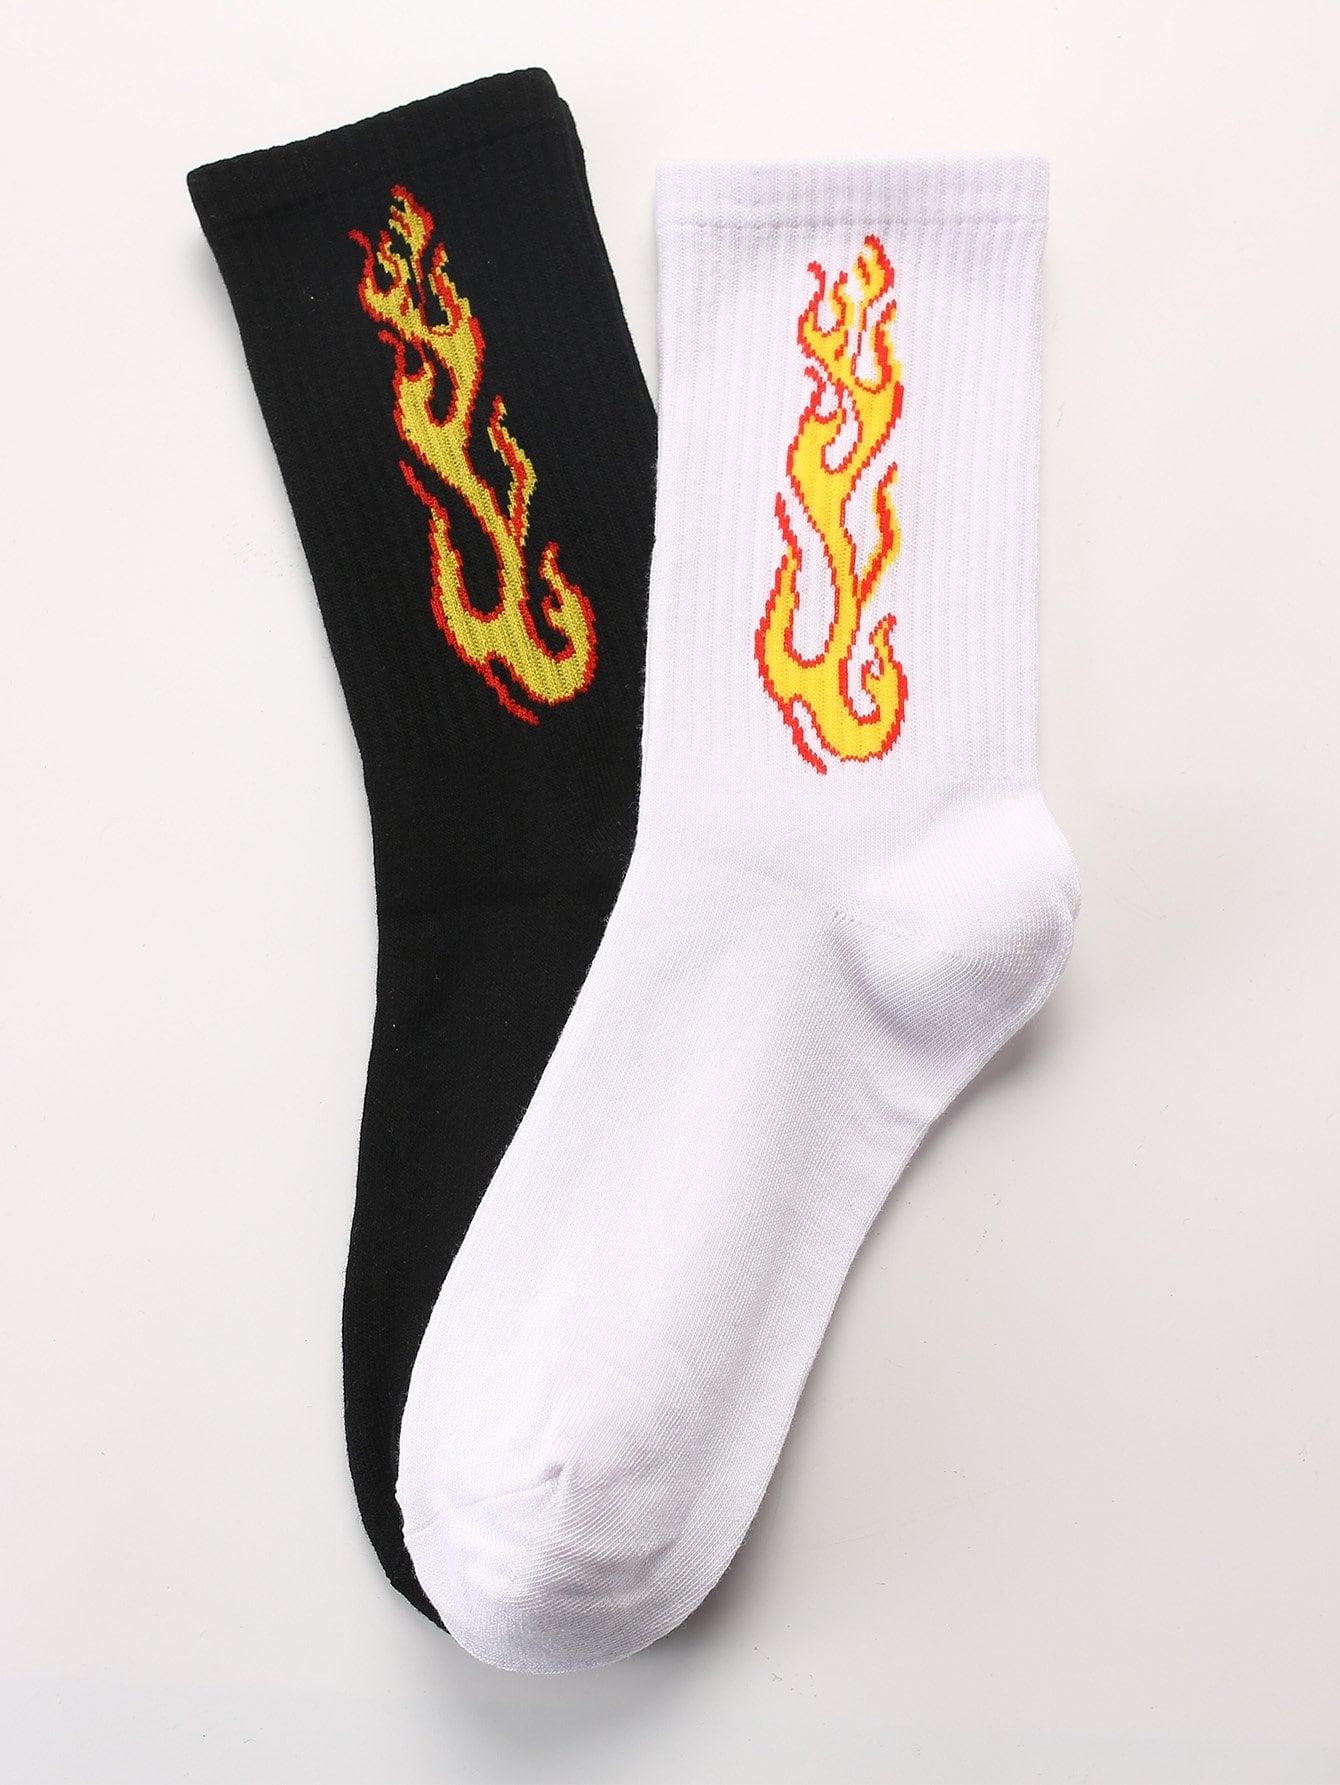 Männer Socken 2Paare mit Flamme Muster